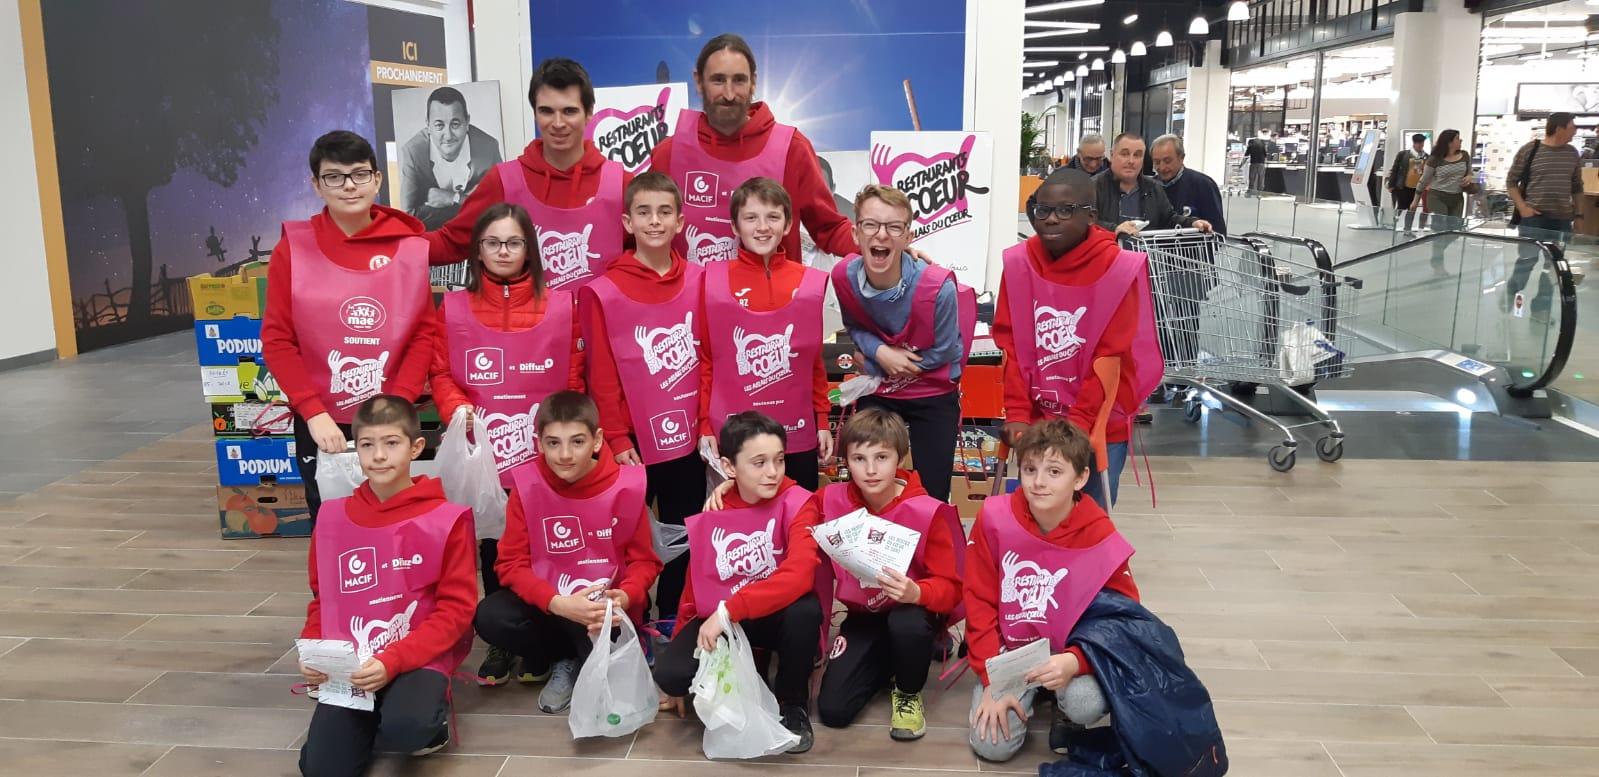 DSCP - 2019-03-08 - U13 - Collecte Restos du Coeur 3